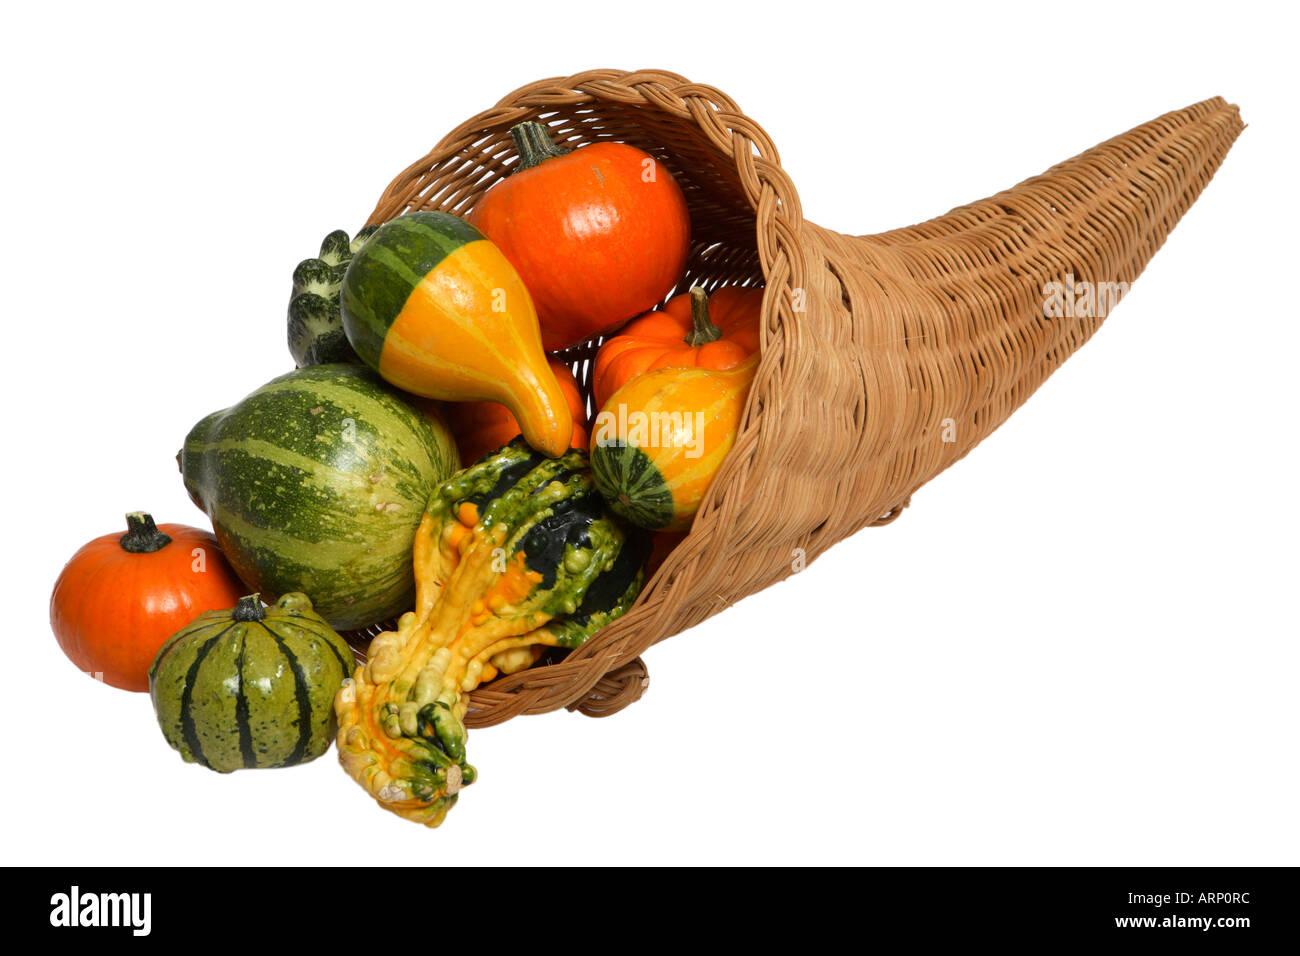 Cornucopia with Squash, Pumpkins and Gourds - Stock Image